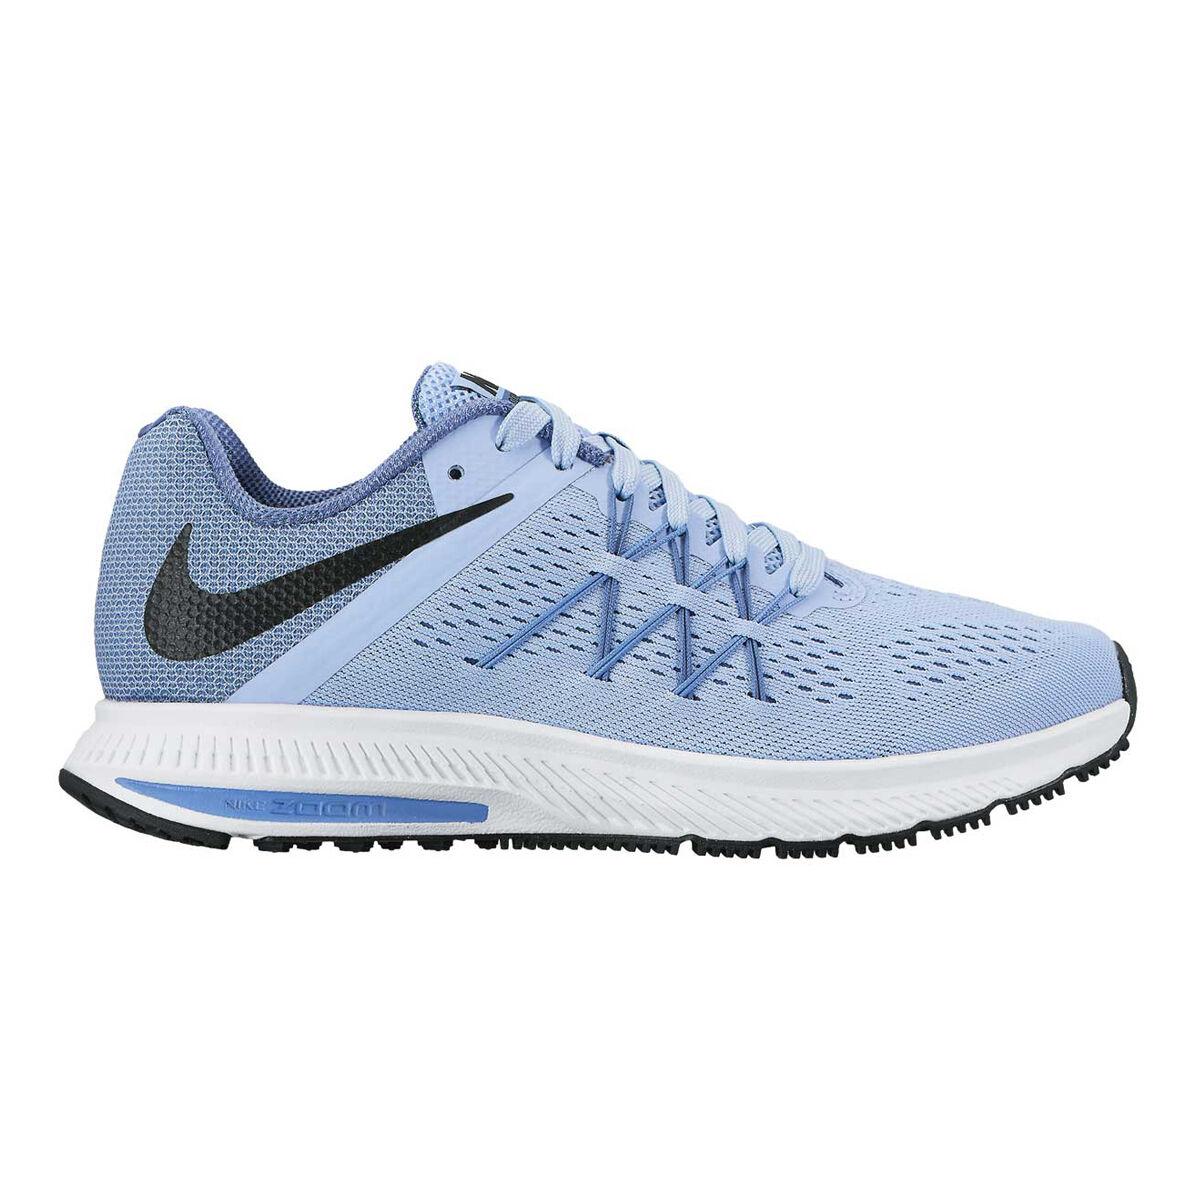 7c7b2d20b59 Nike Zoom 8 Running Shoes